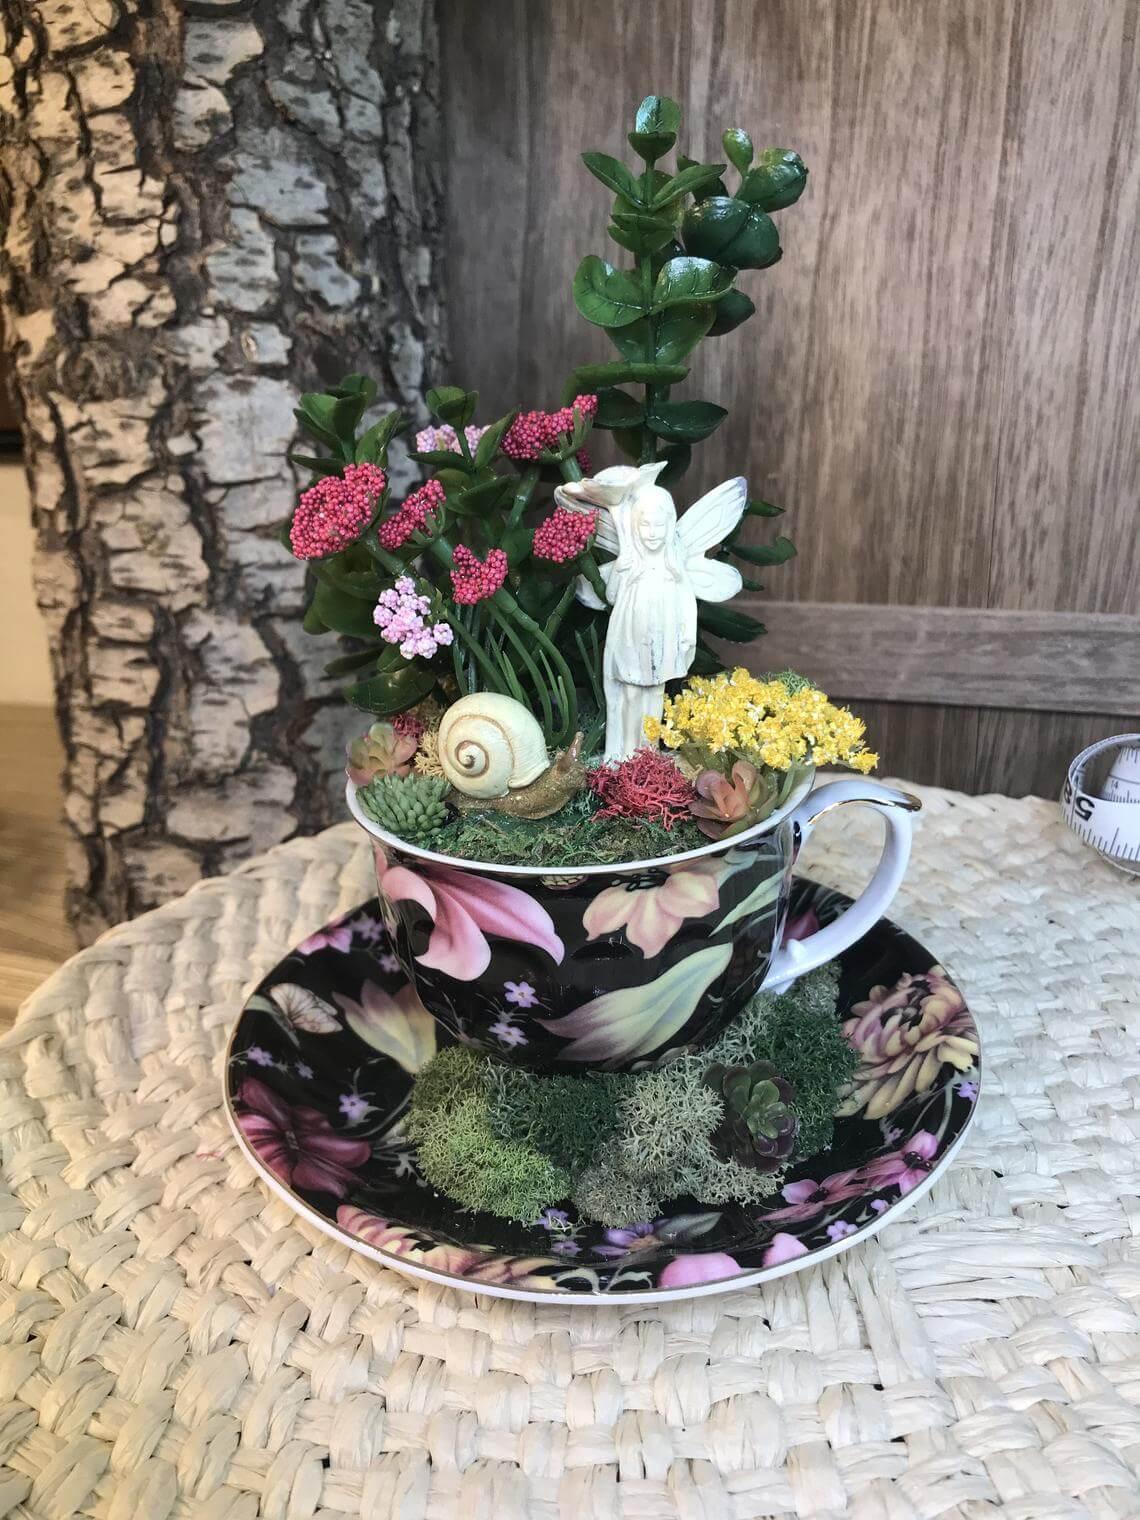 Jardin de tasse de thé miniature de statue de fée et d'escargot